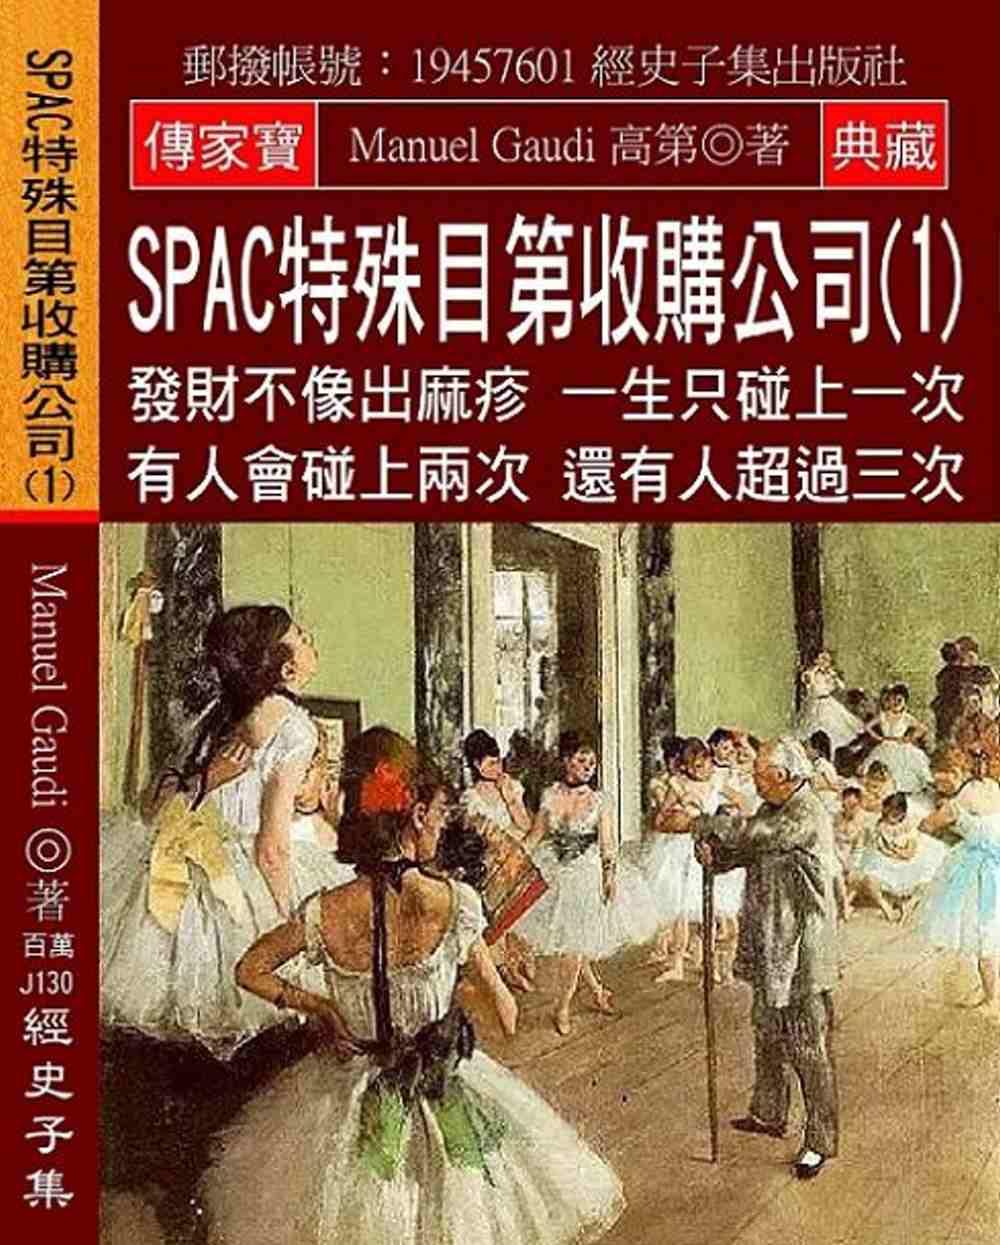 SPAC特殊目第收購公司(1)...